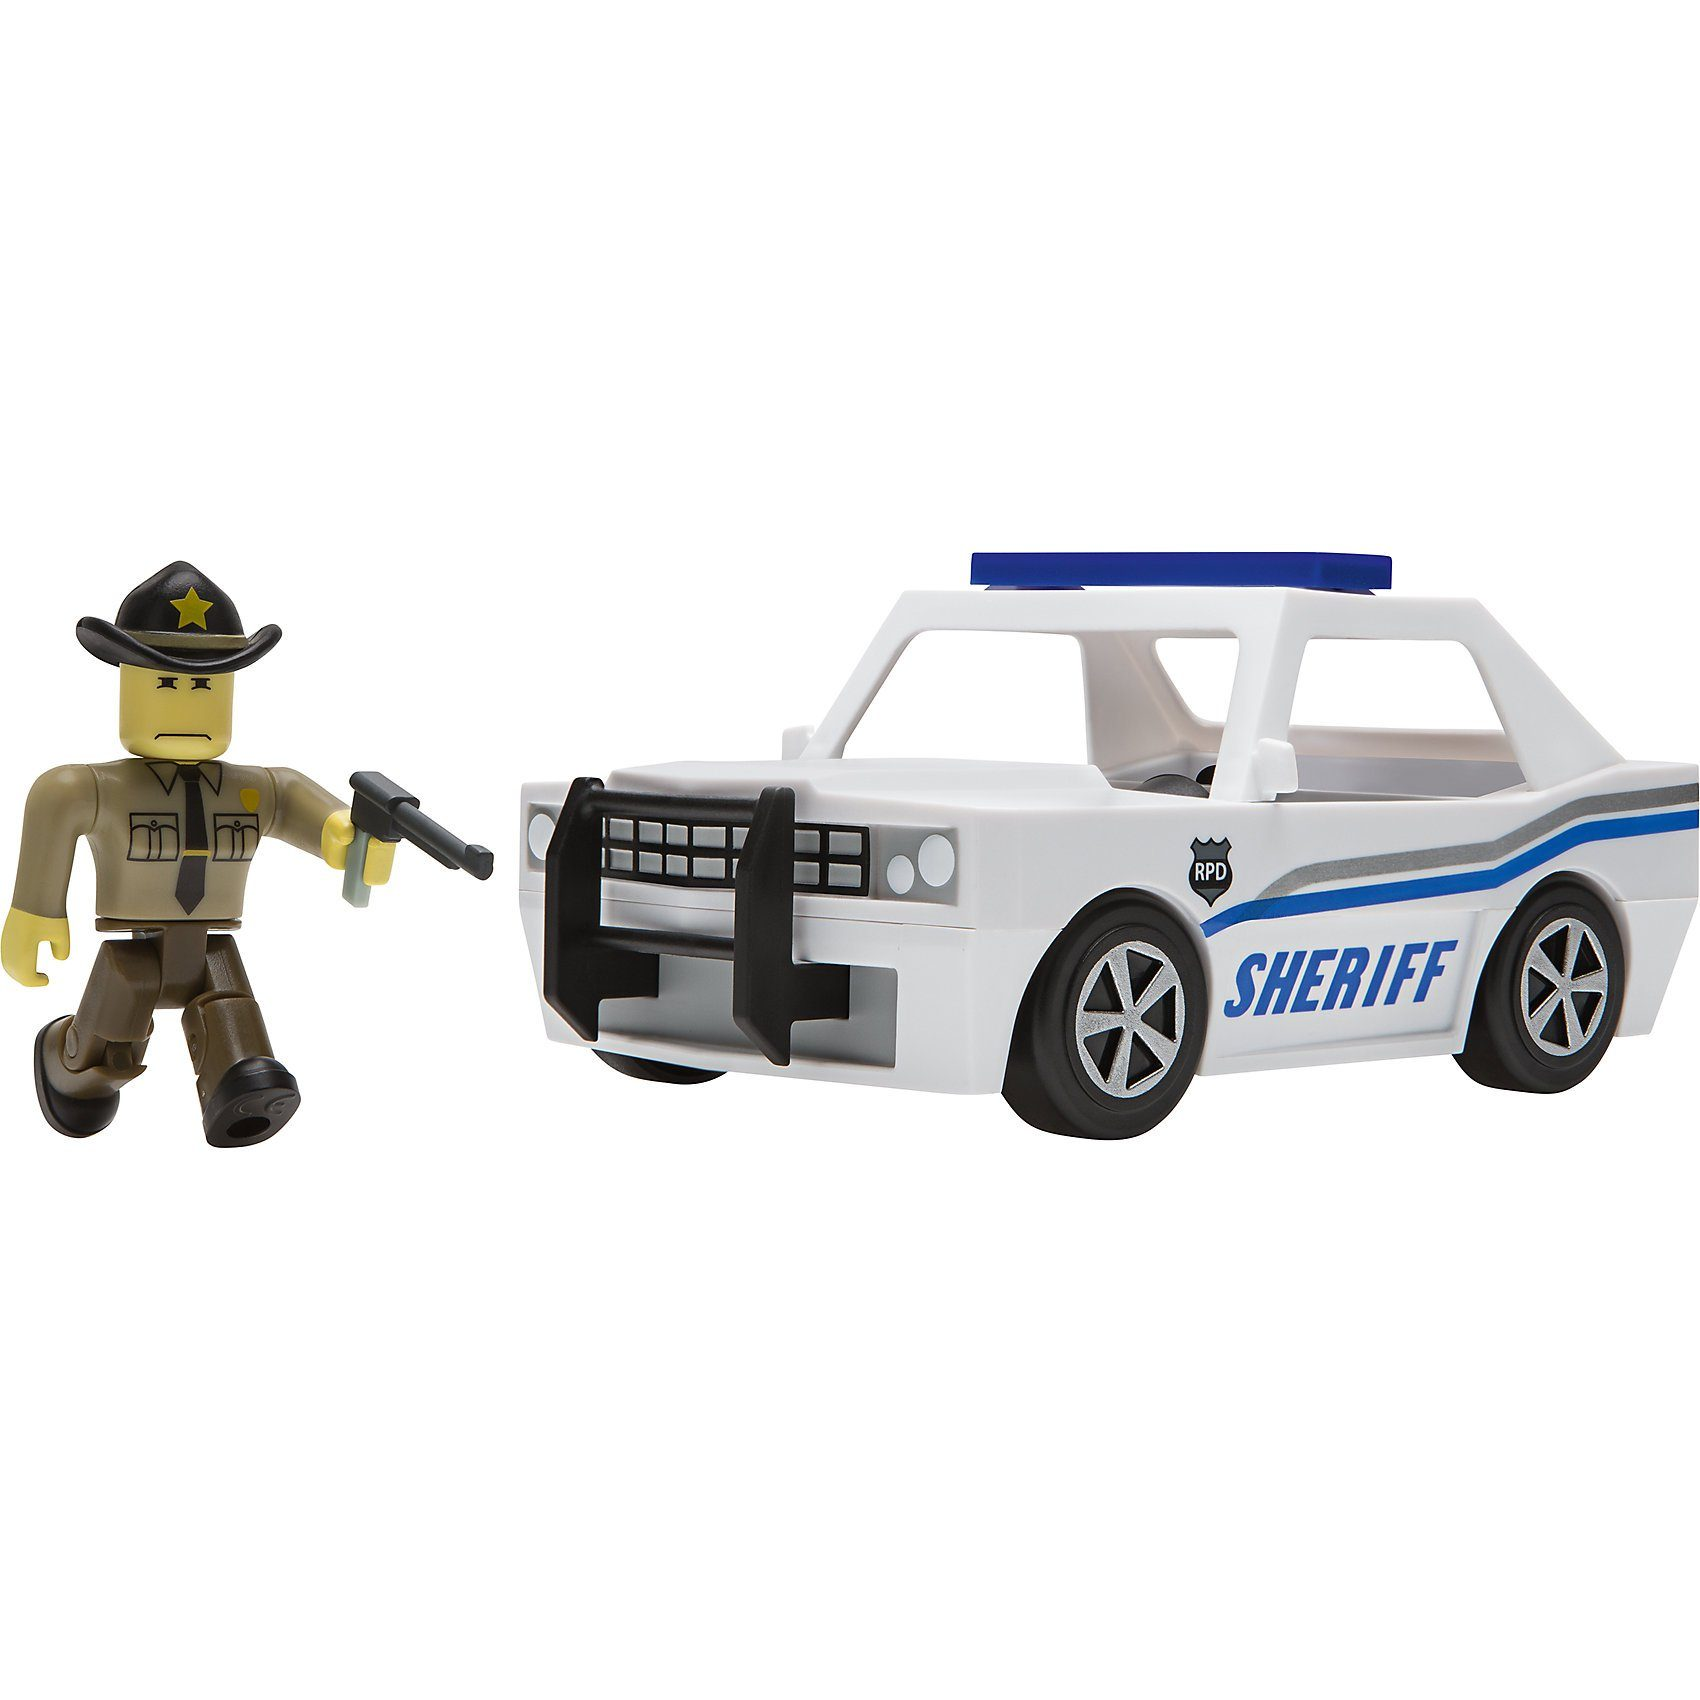 Jazwares ROBLOX Fahrzeug - The Neighborhood of Robloxia Patrol Car